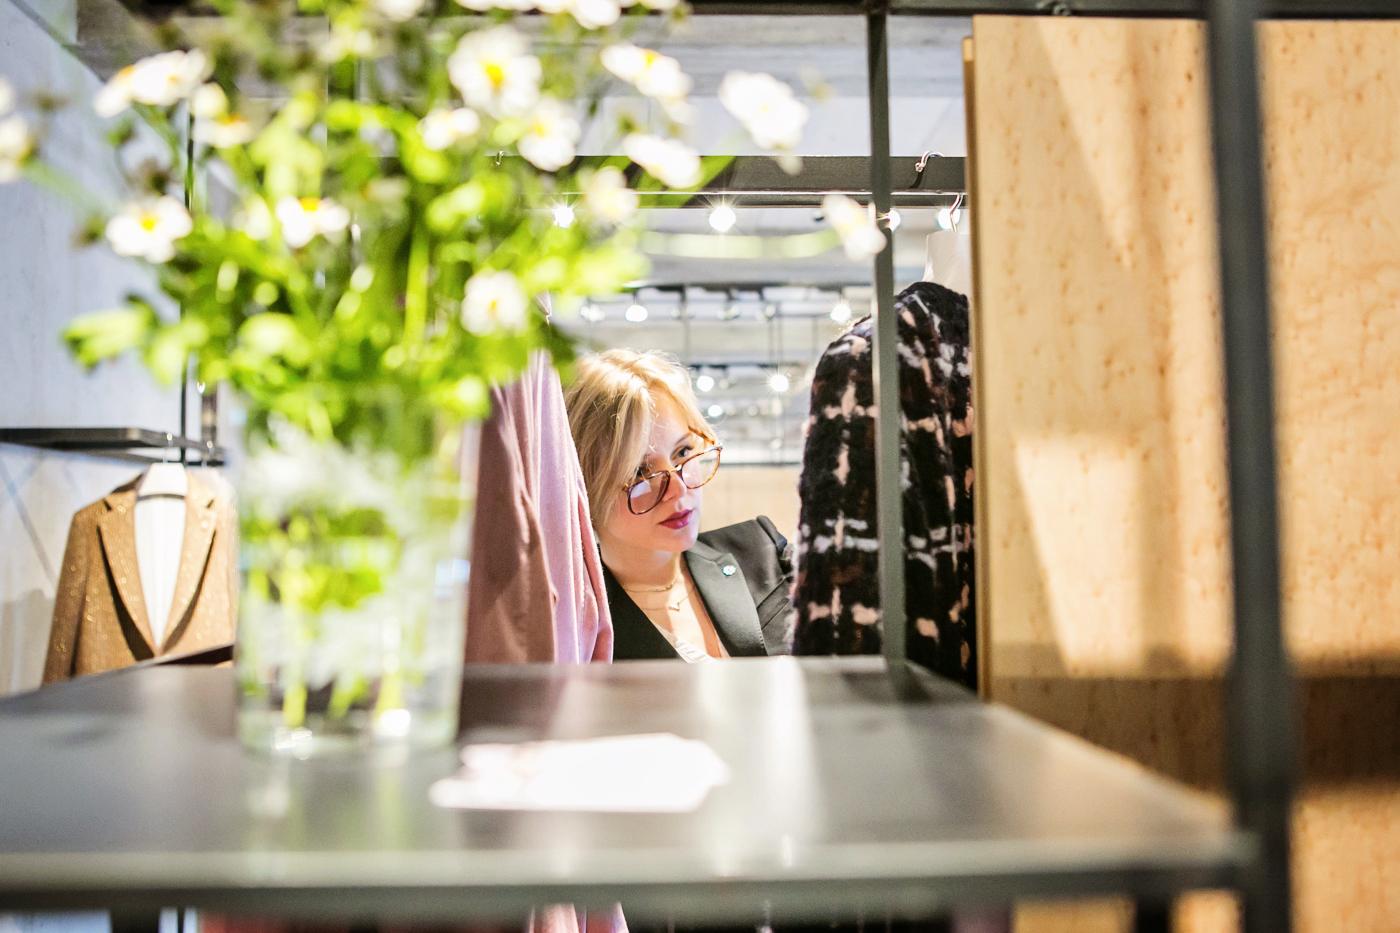 darya kamalova from thecablook com on lardini presentation in Milan and in attila showroom wearing lardini perfect black jacket with marni retro clutch and sophia webster kitten heels-8